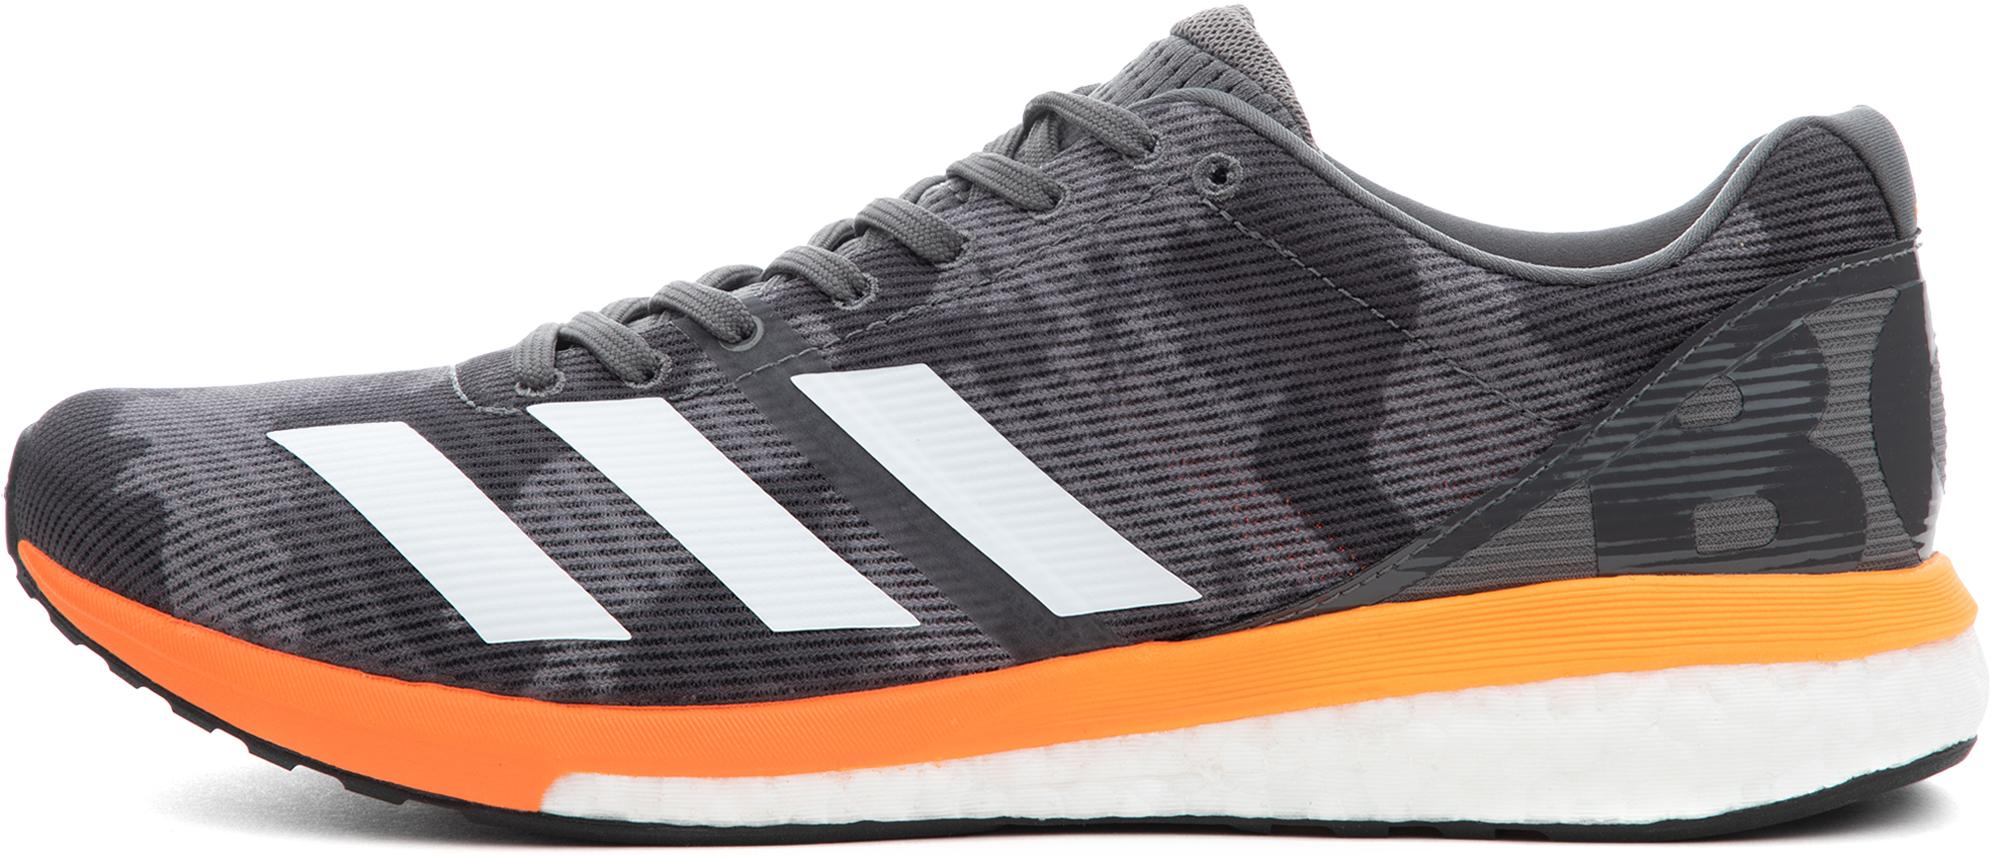 Adidas Кроссовки мужские Adidas BOSTON, размер 40,5 цена